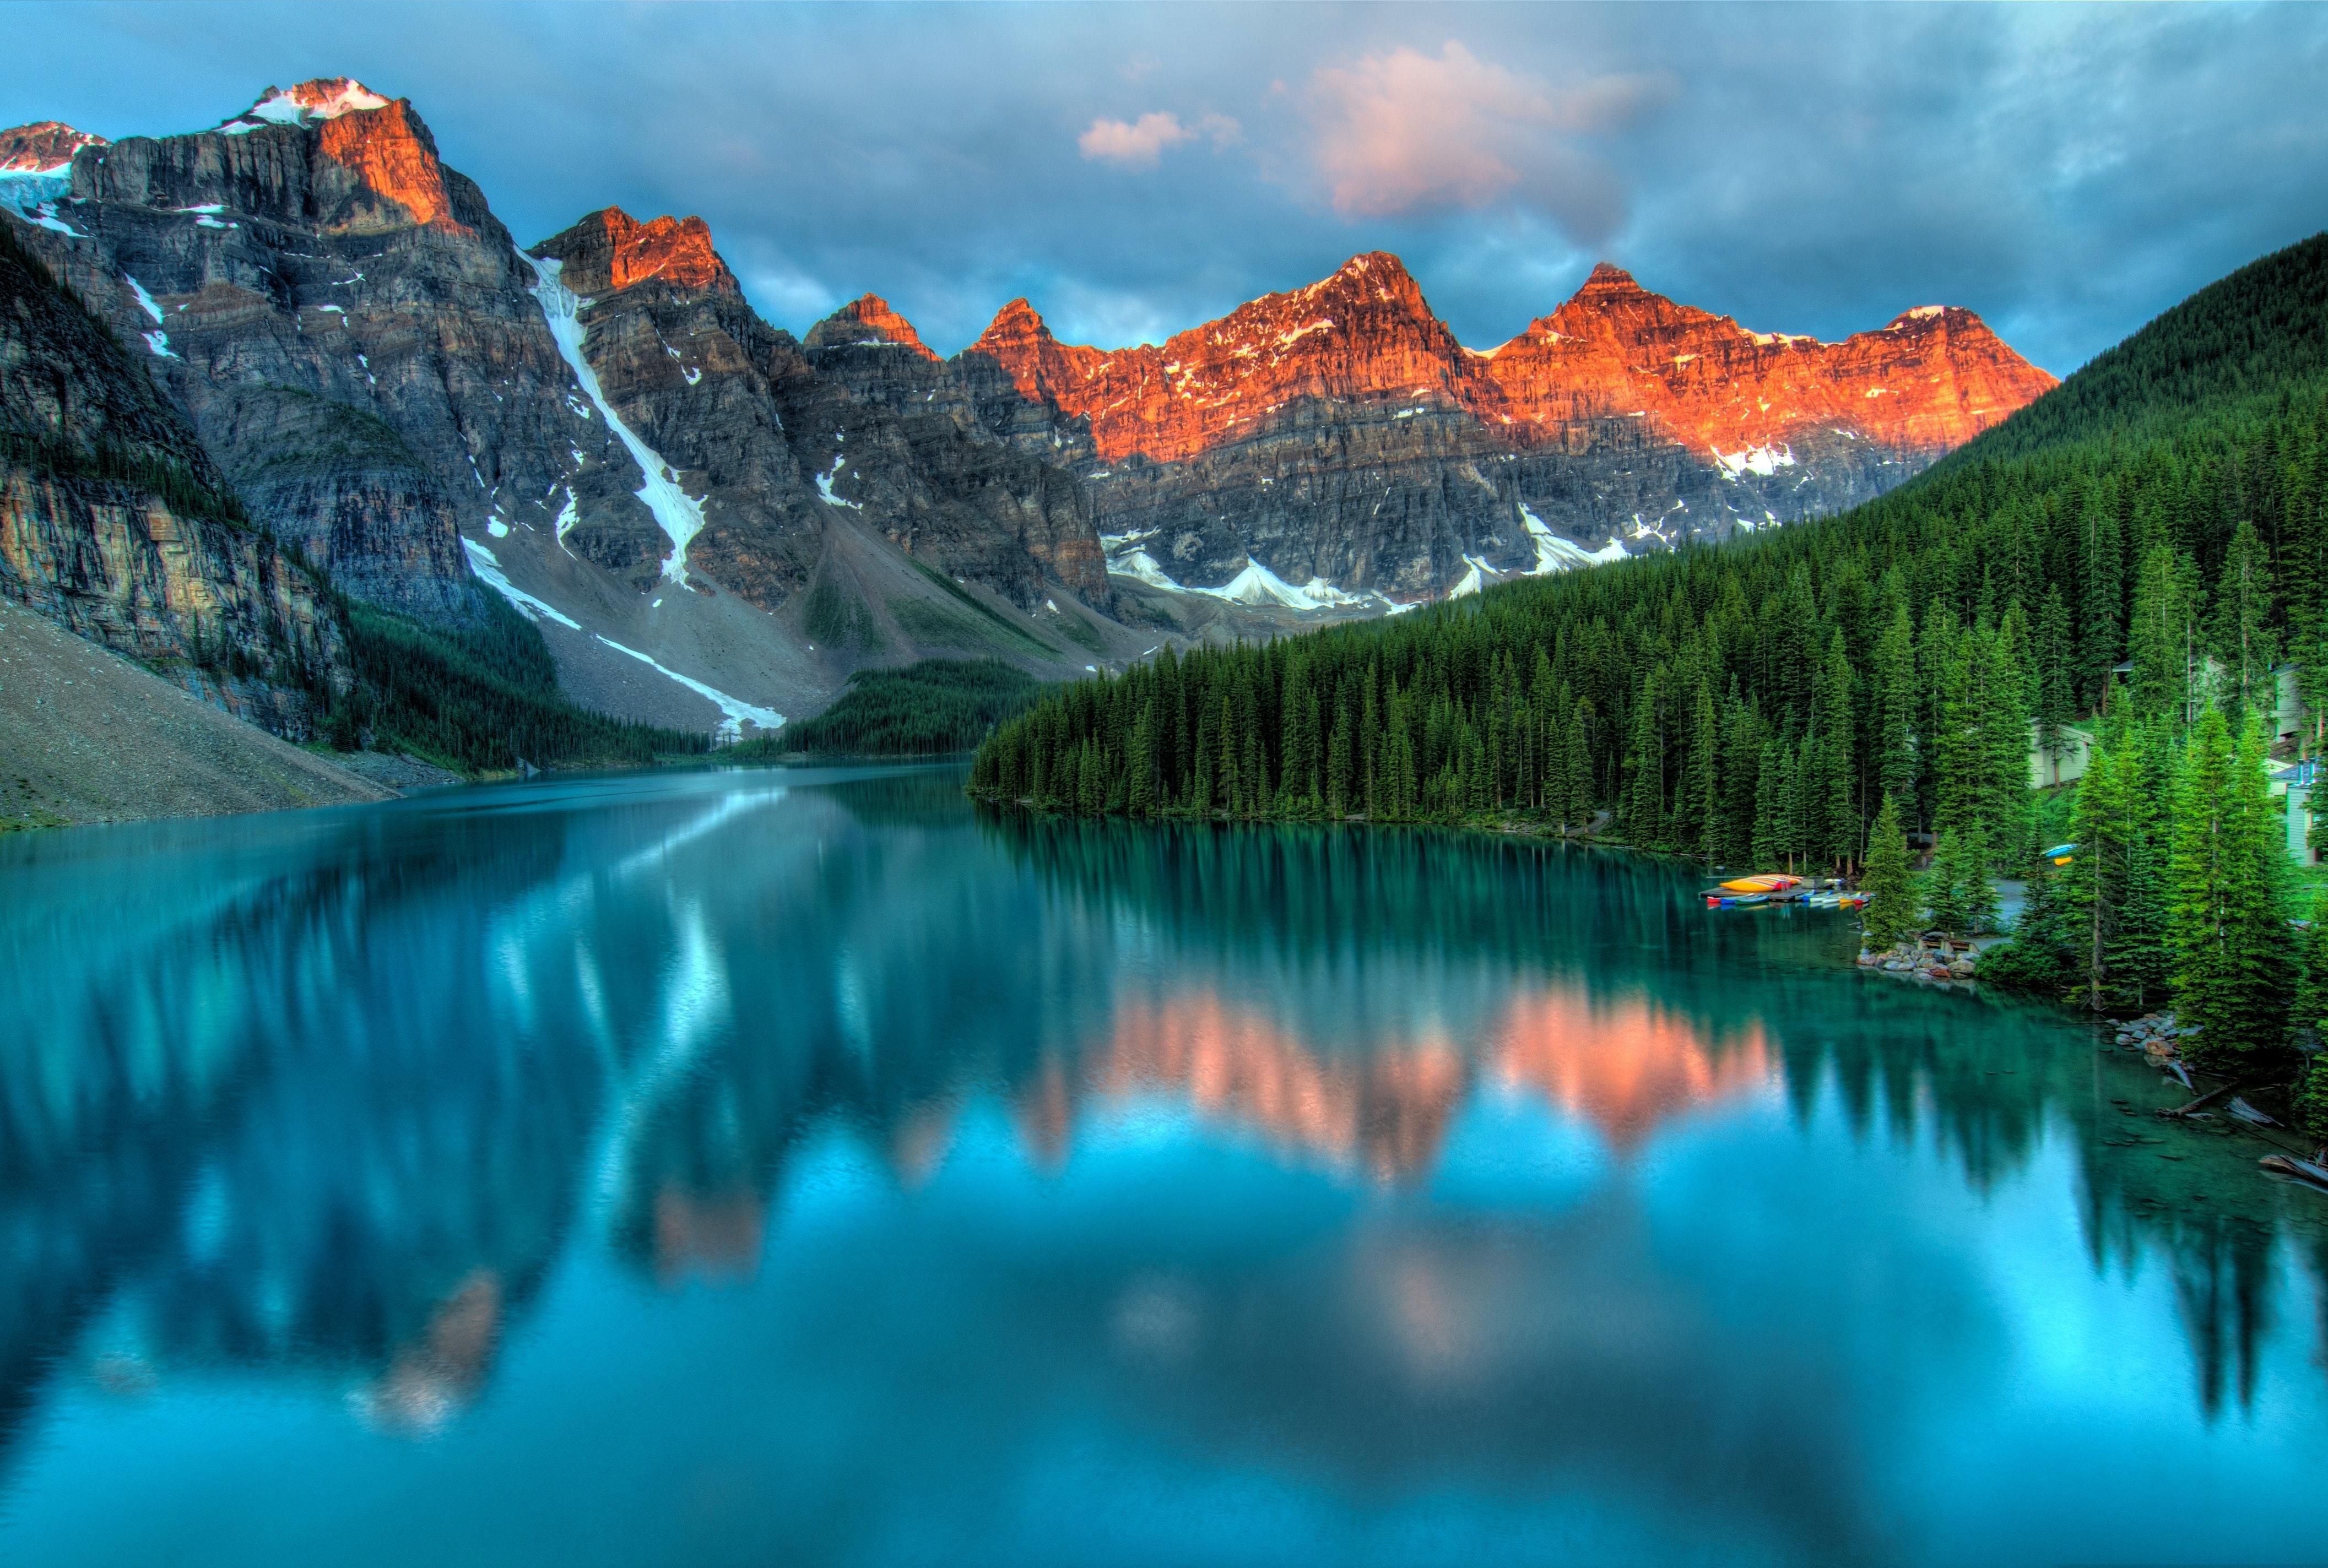 Lake and Mountain by James Wheeler